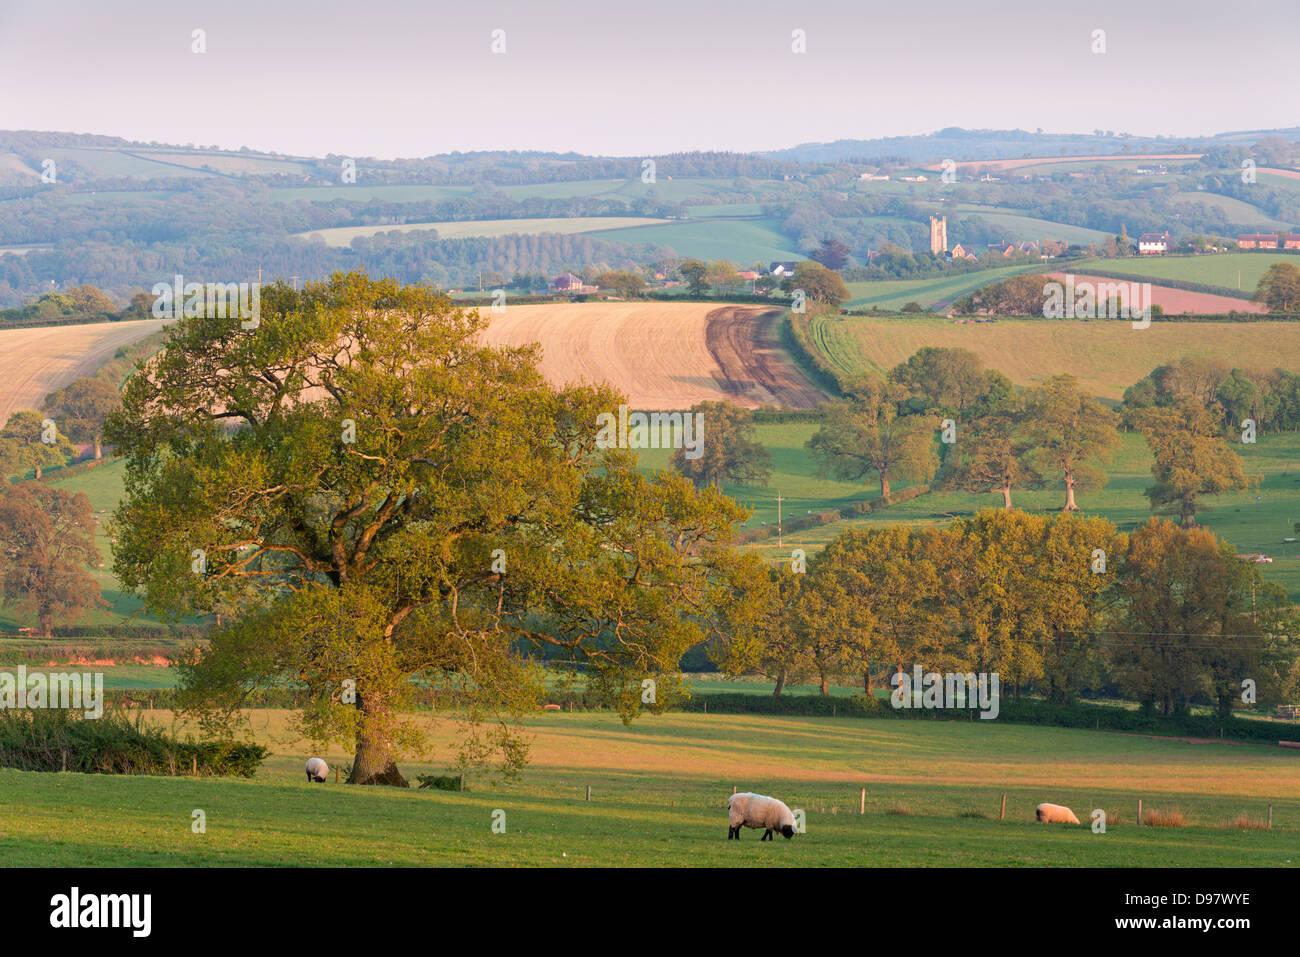 Terres agricoles vallonnées pittoresque, Copplestone, Devon, Angleterre. Printemps (mai) 2013 Photo Stock